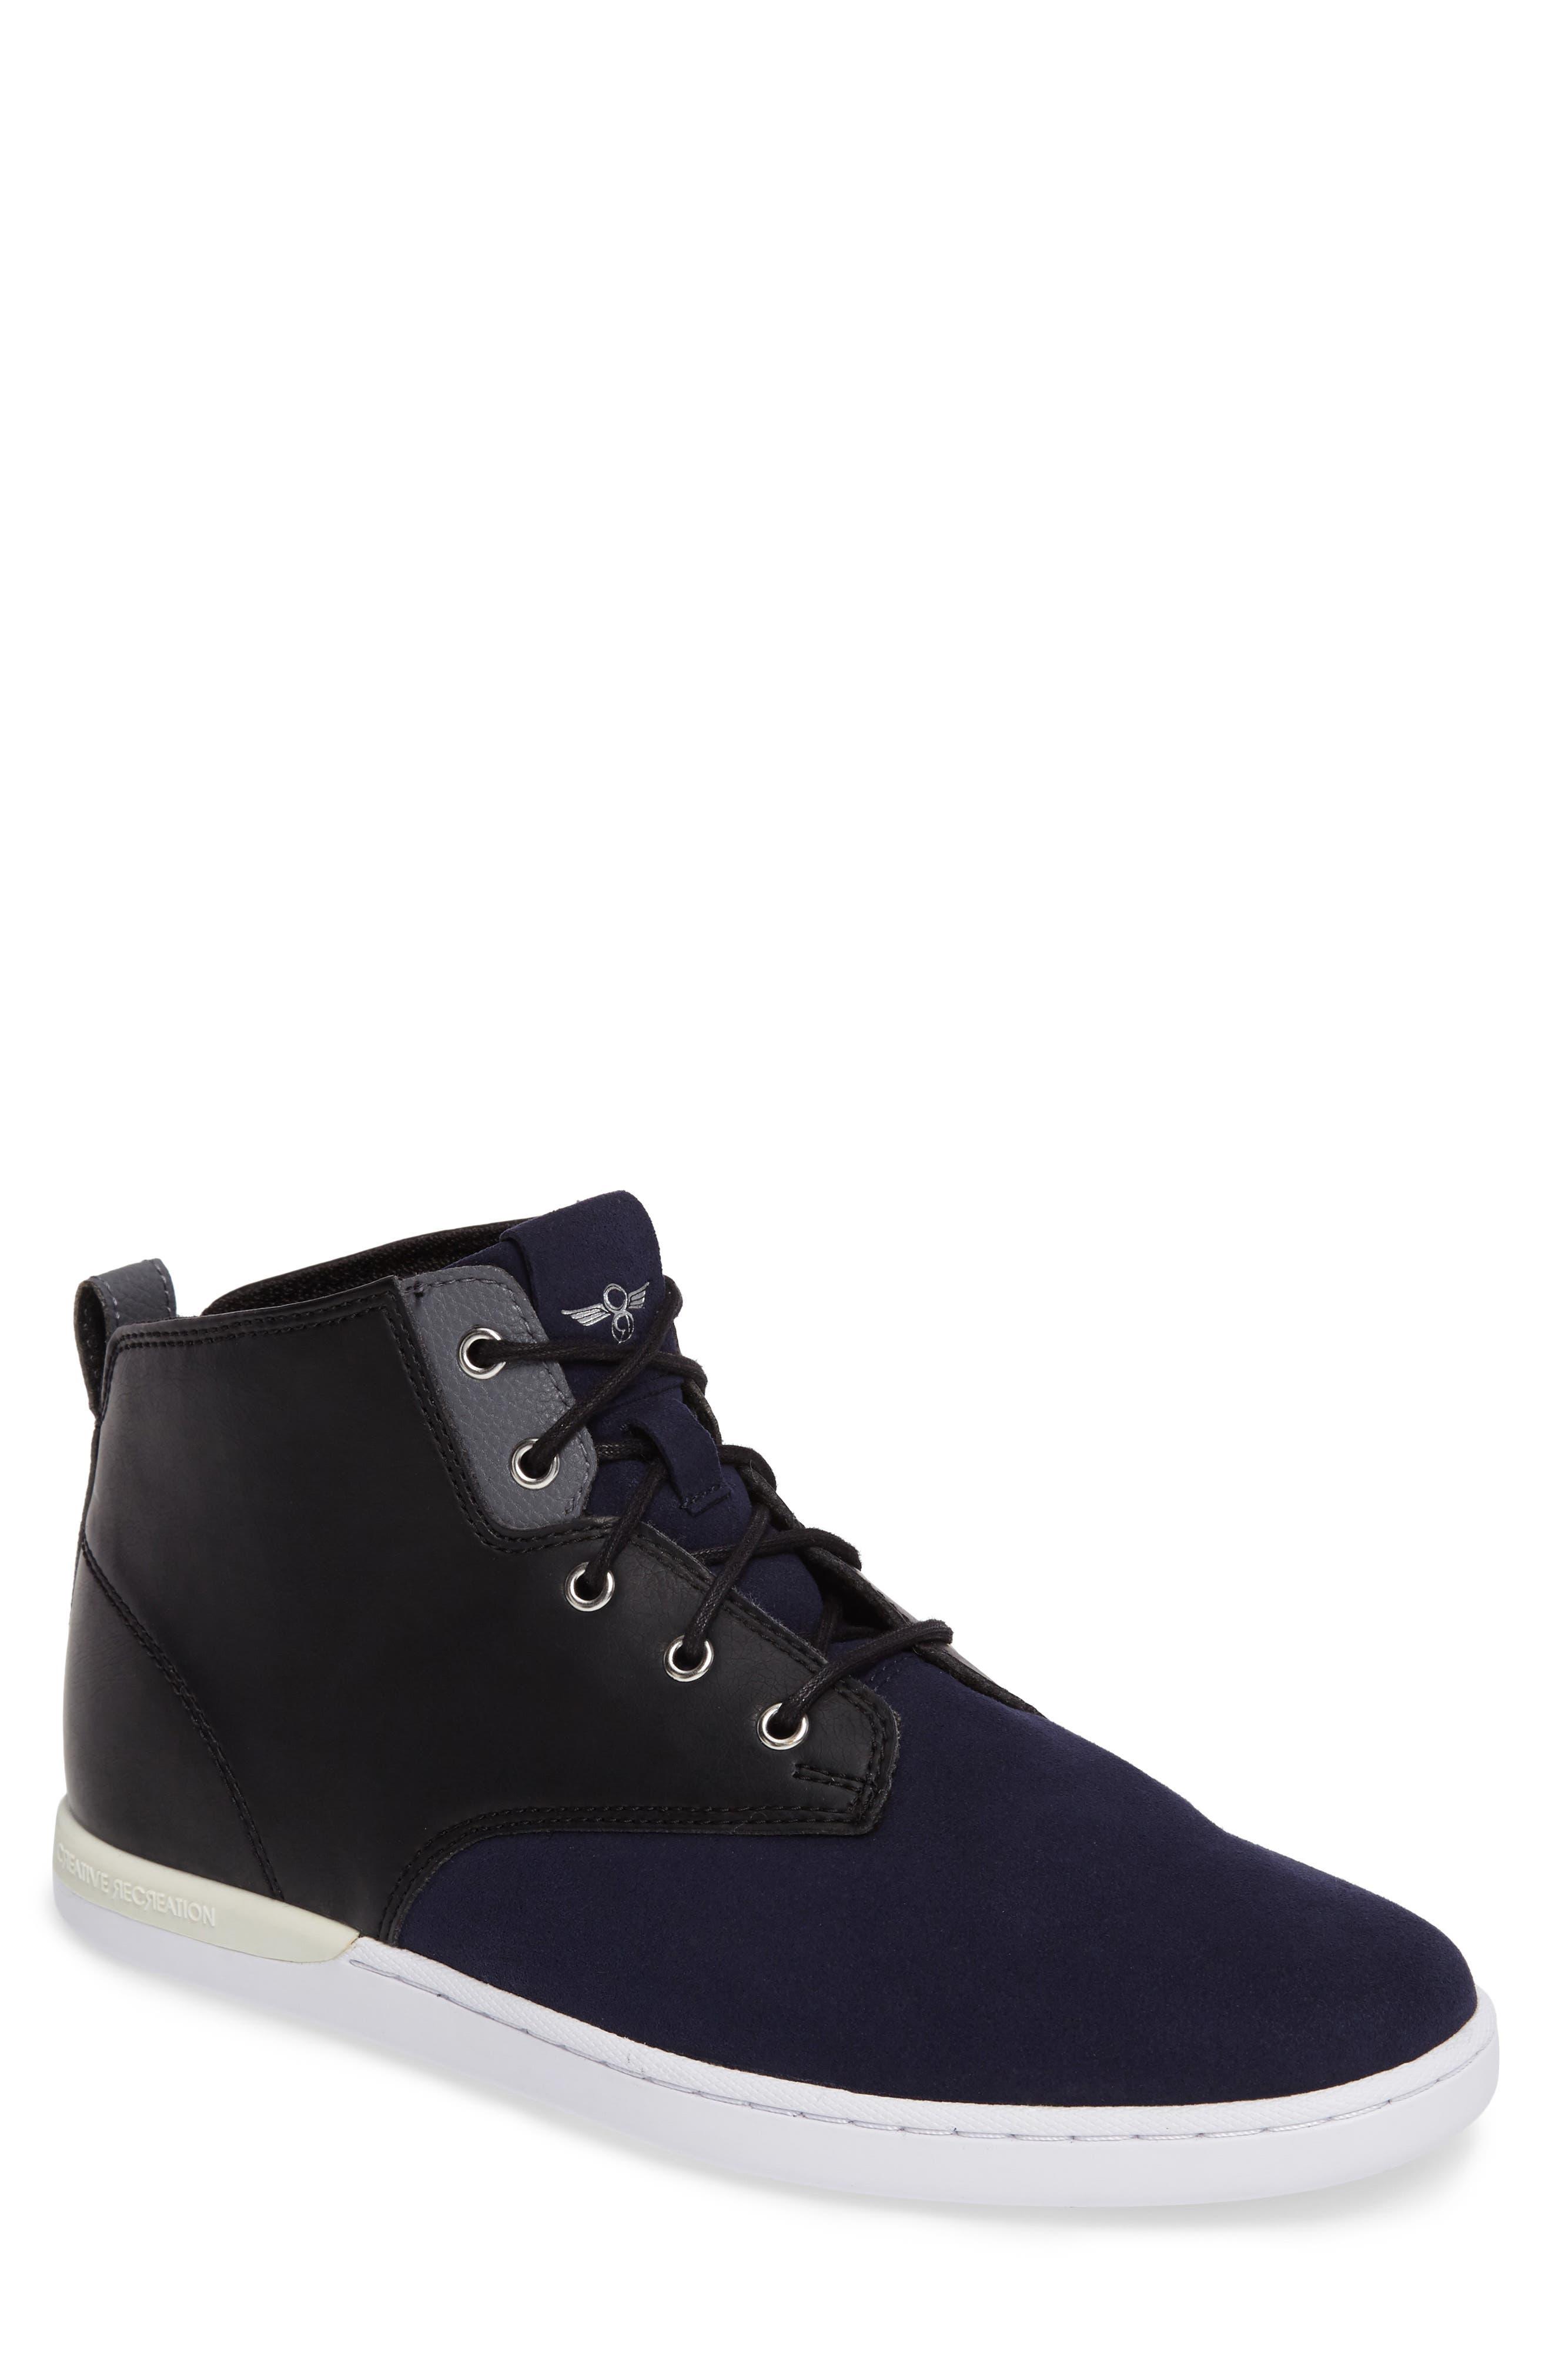 Creative Recreation 'Vito' Sneaker (Men)